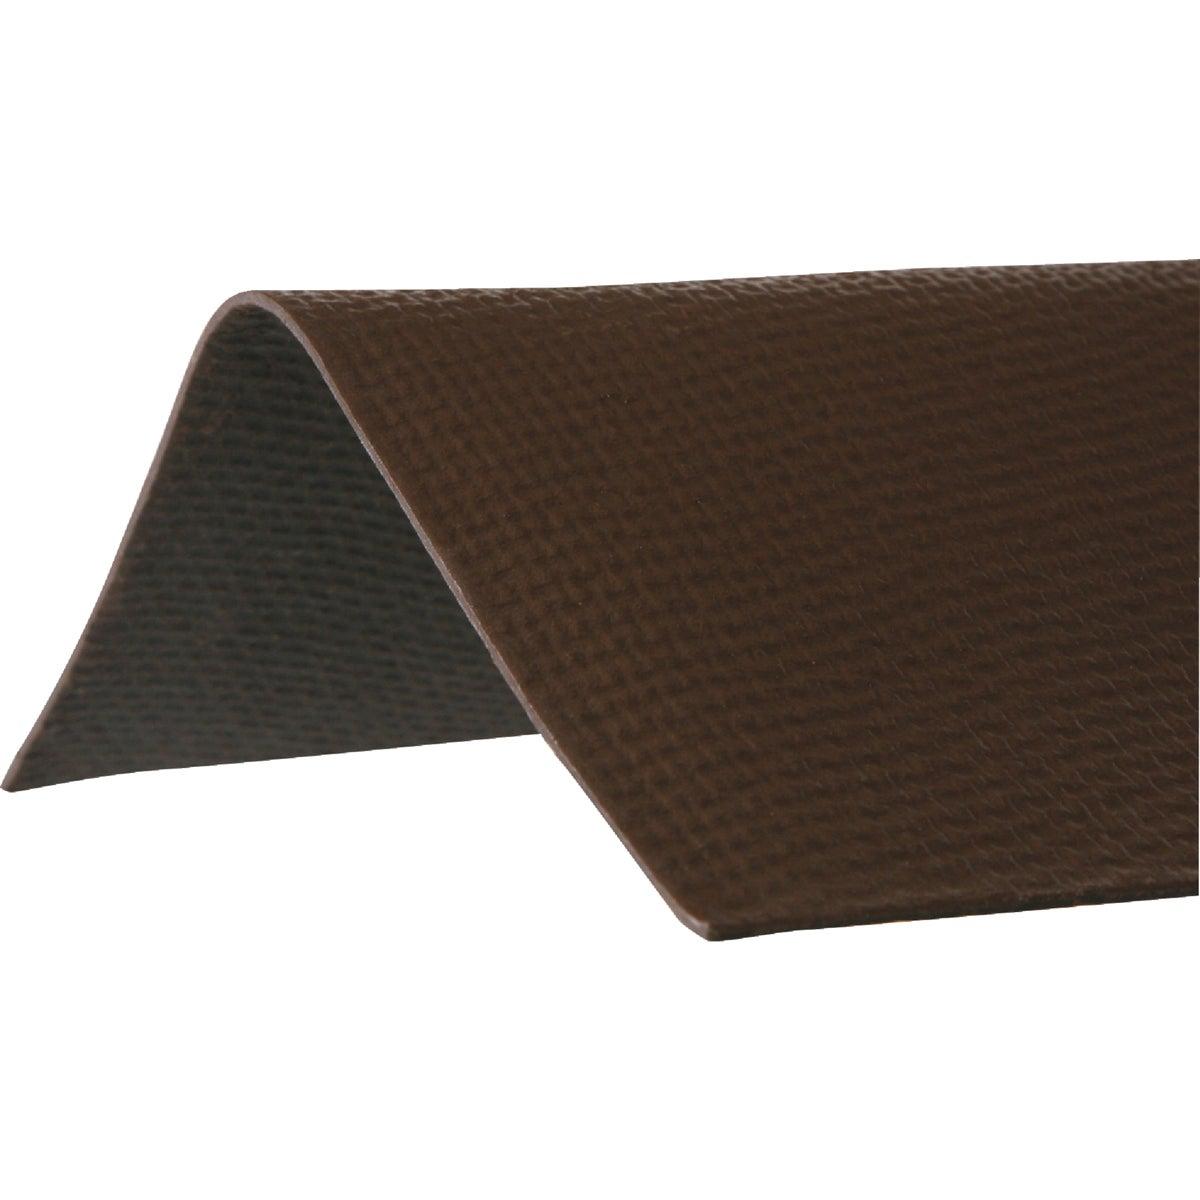 BROWN NARROW RIDGE CAP